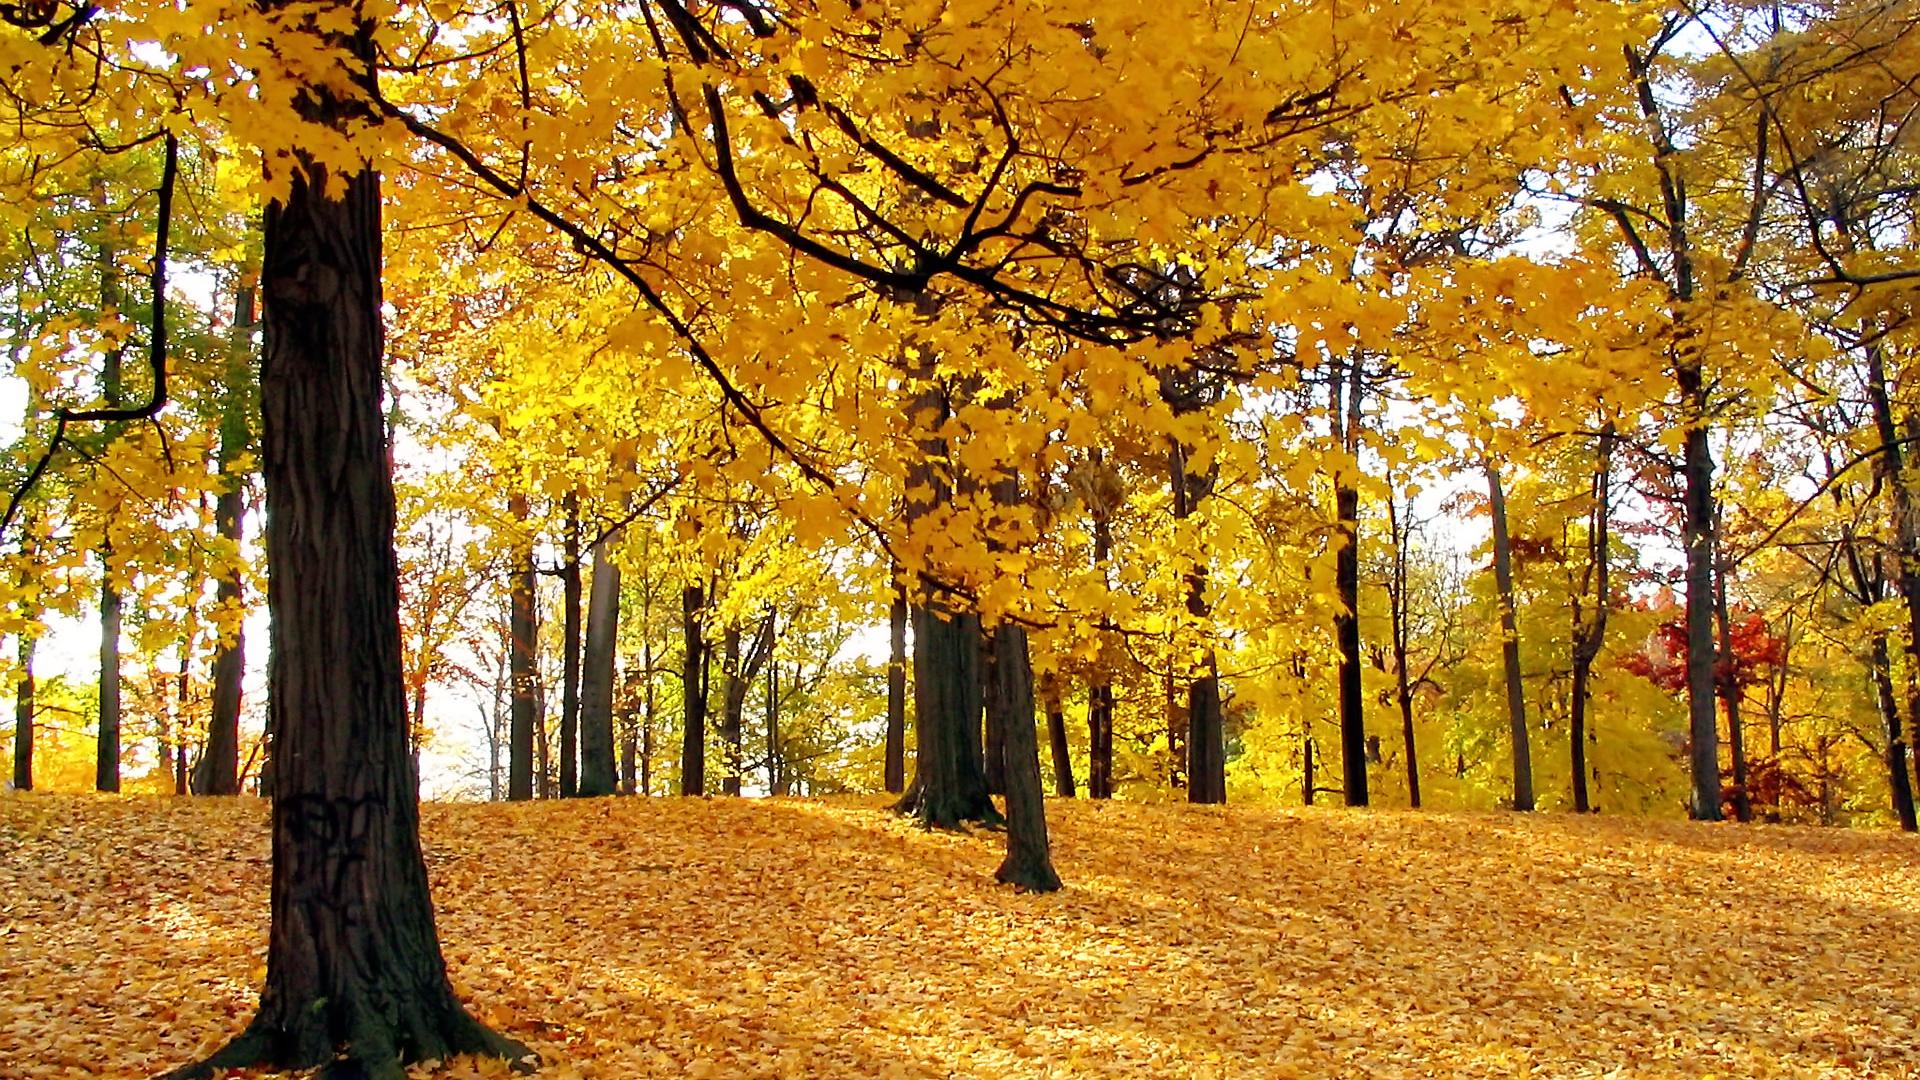 Autumn trees 1920 x 1080 Forest Photography MIRIADNACOM 1920x1080